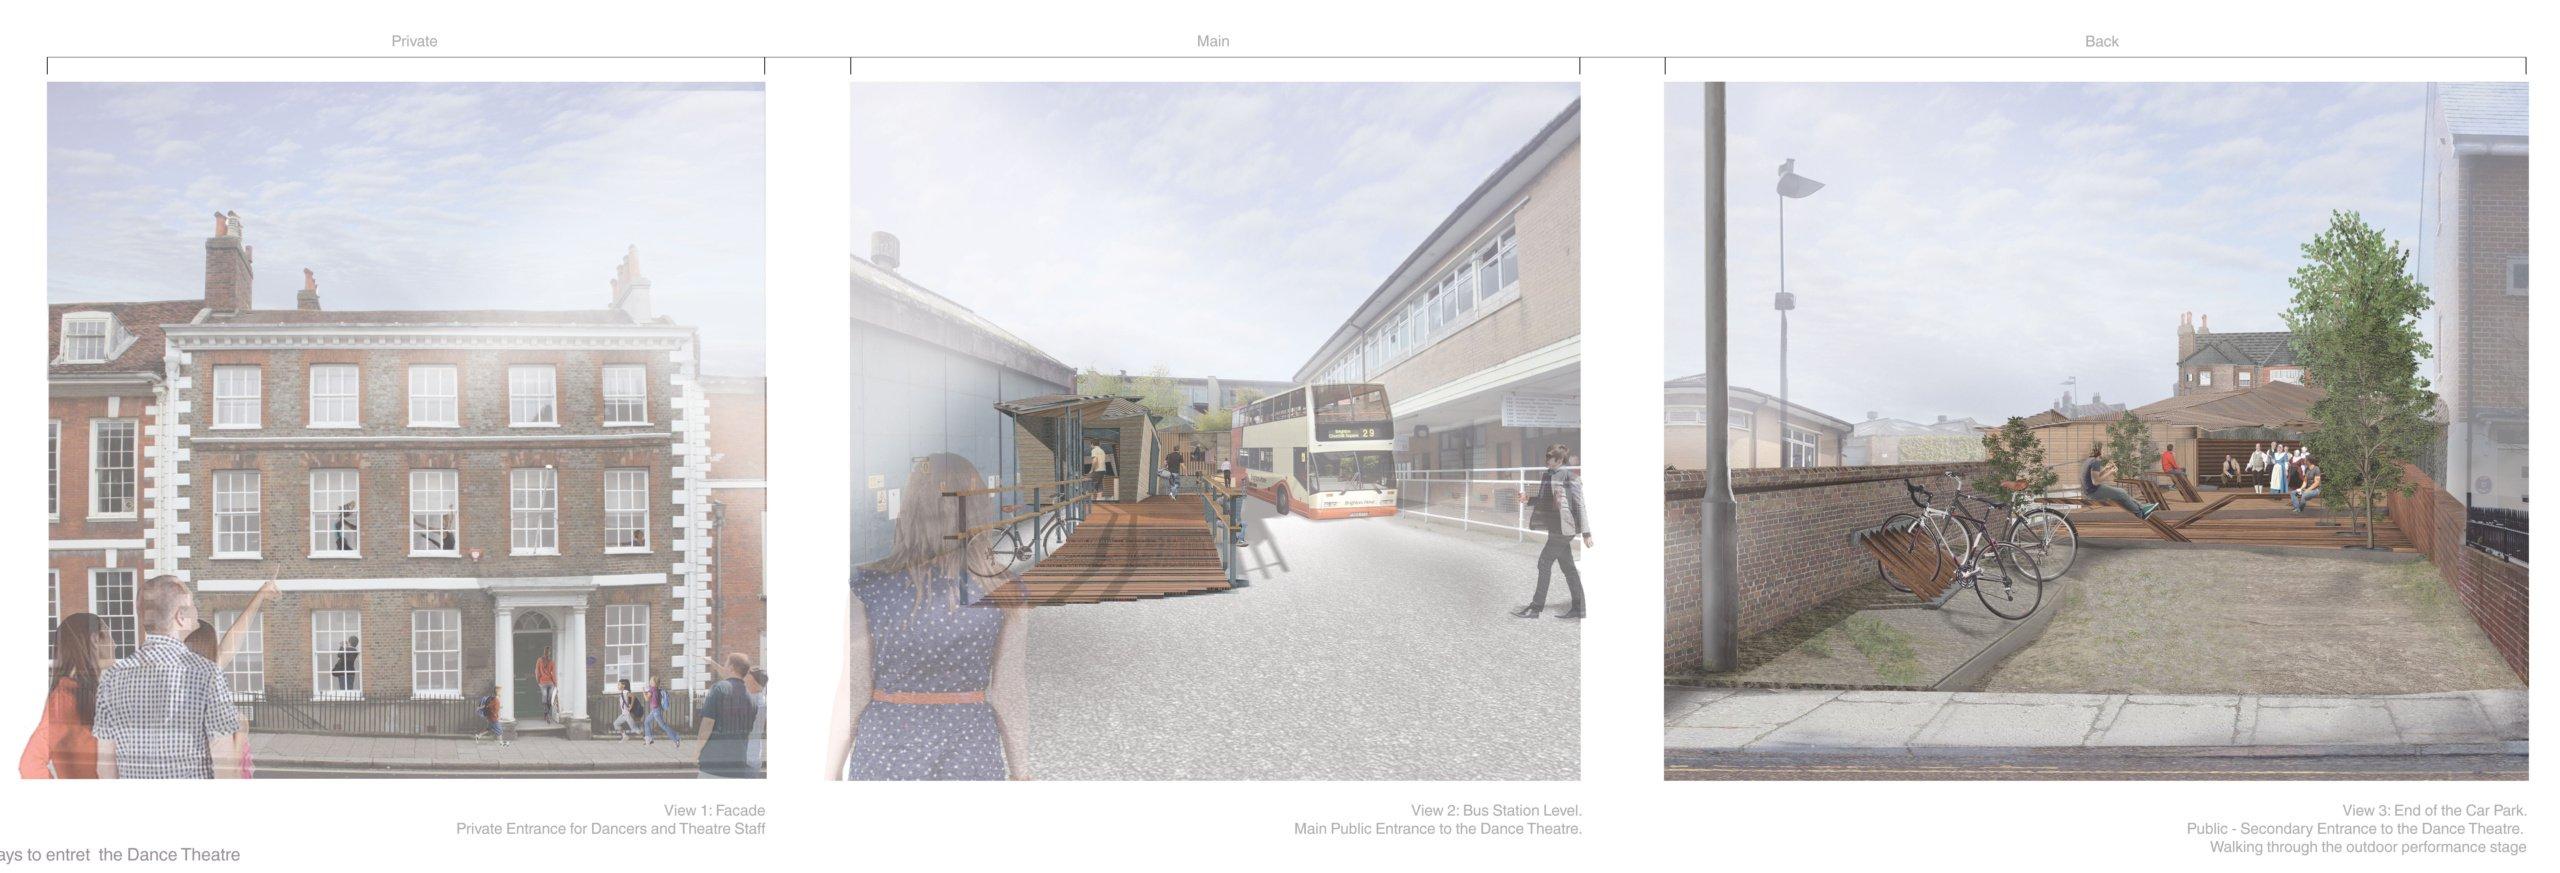 ana_sidorova technology-Dance Theatre Lewes town (31)